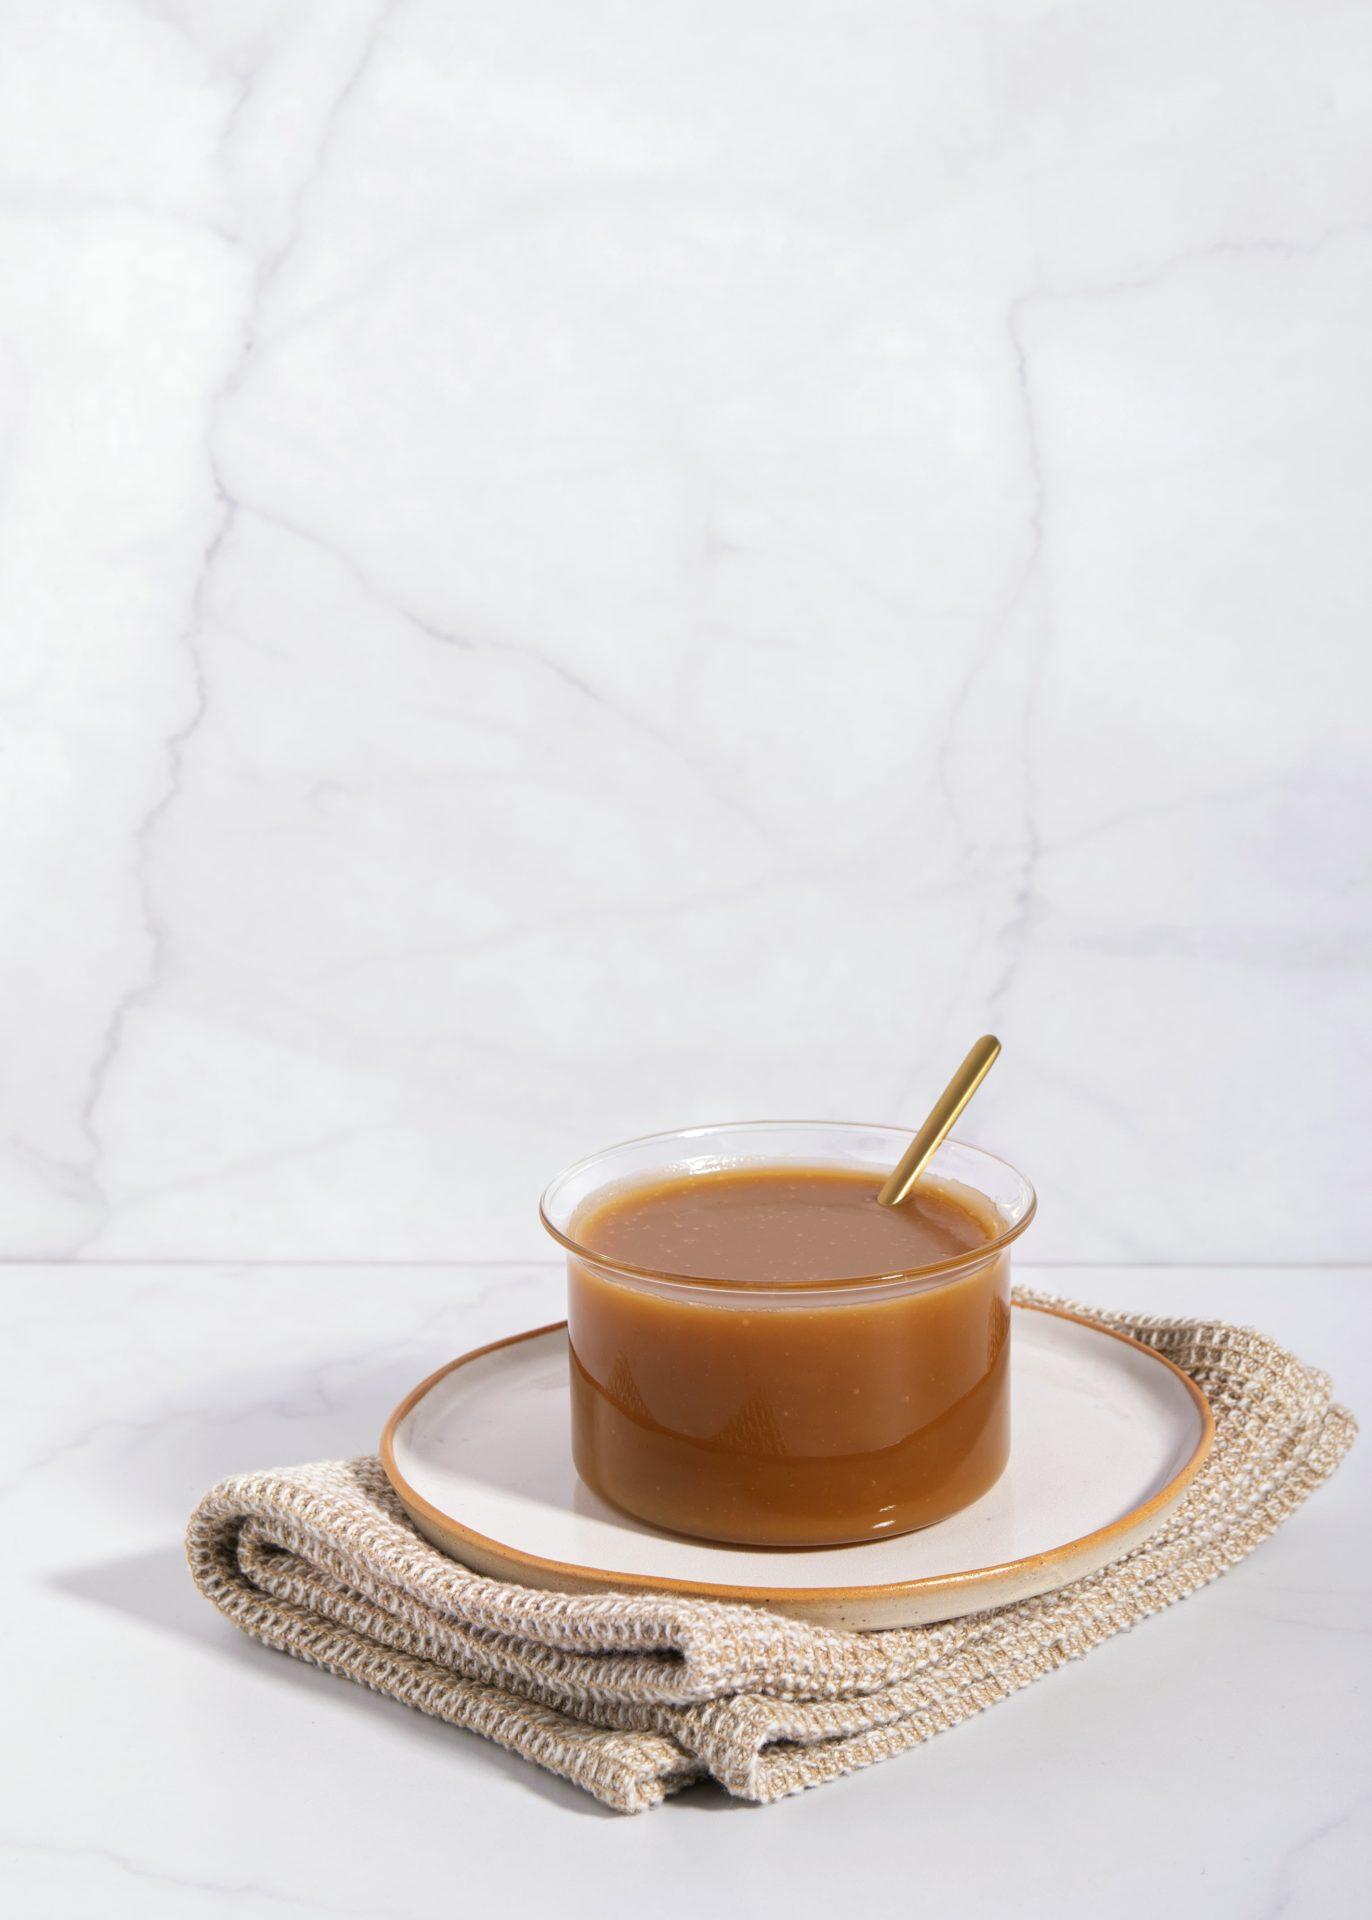 brown sugar caramel - how to make caramel with brown sugar